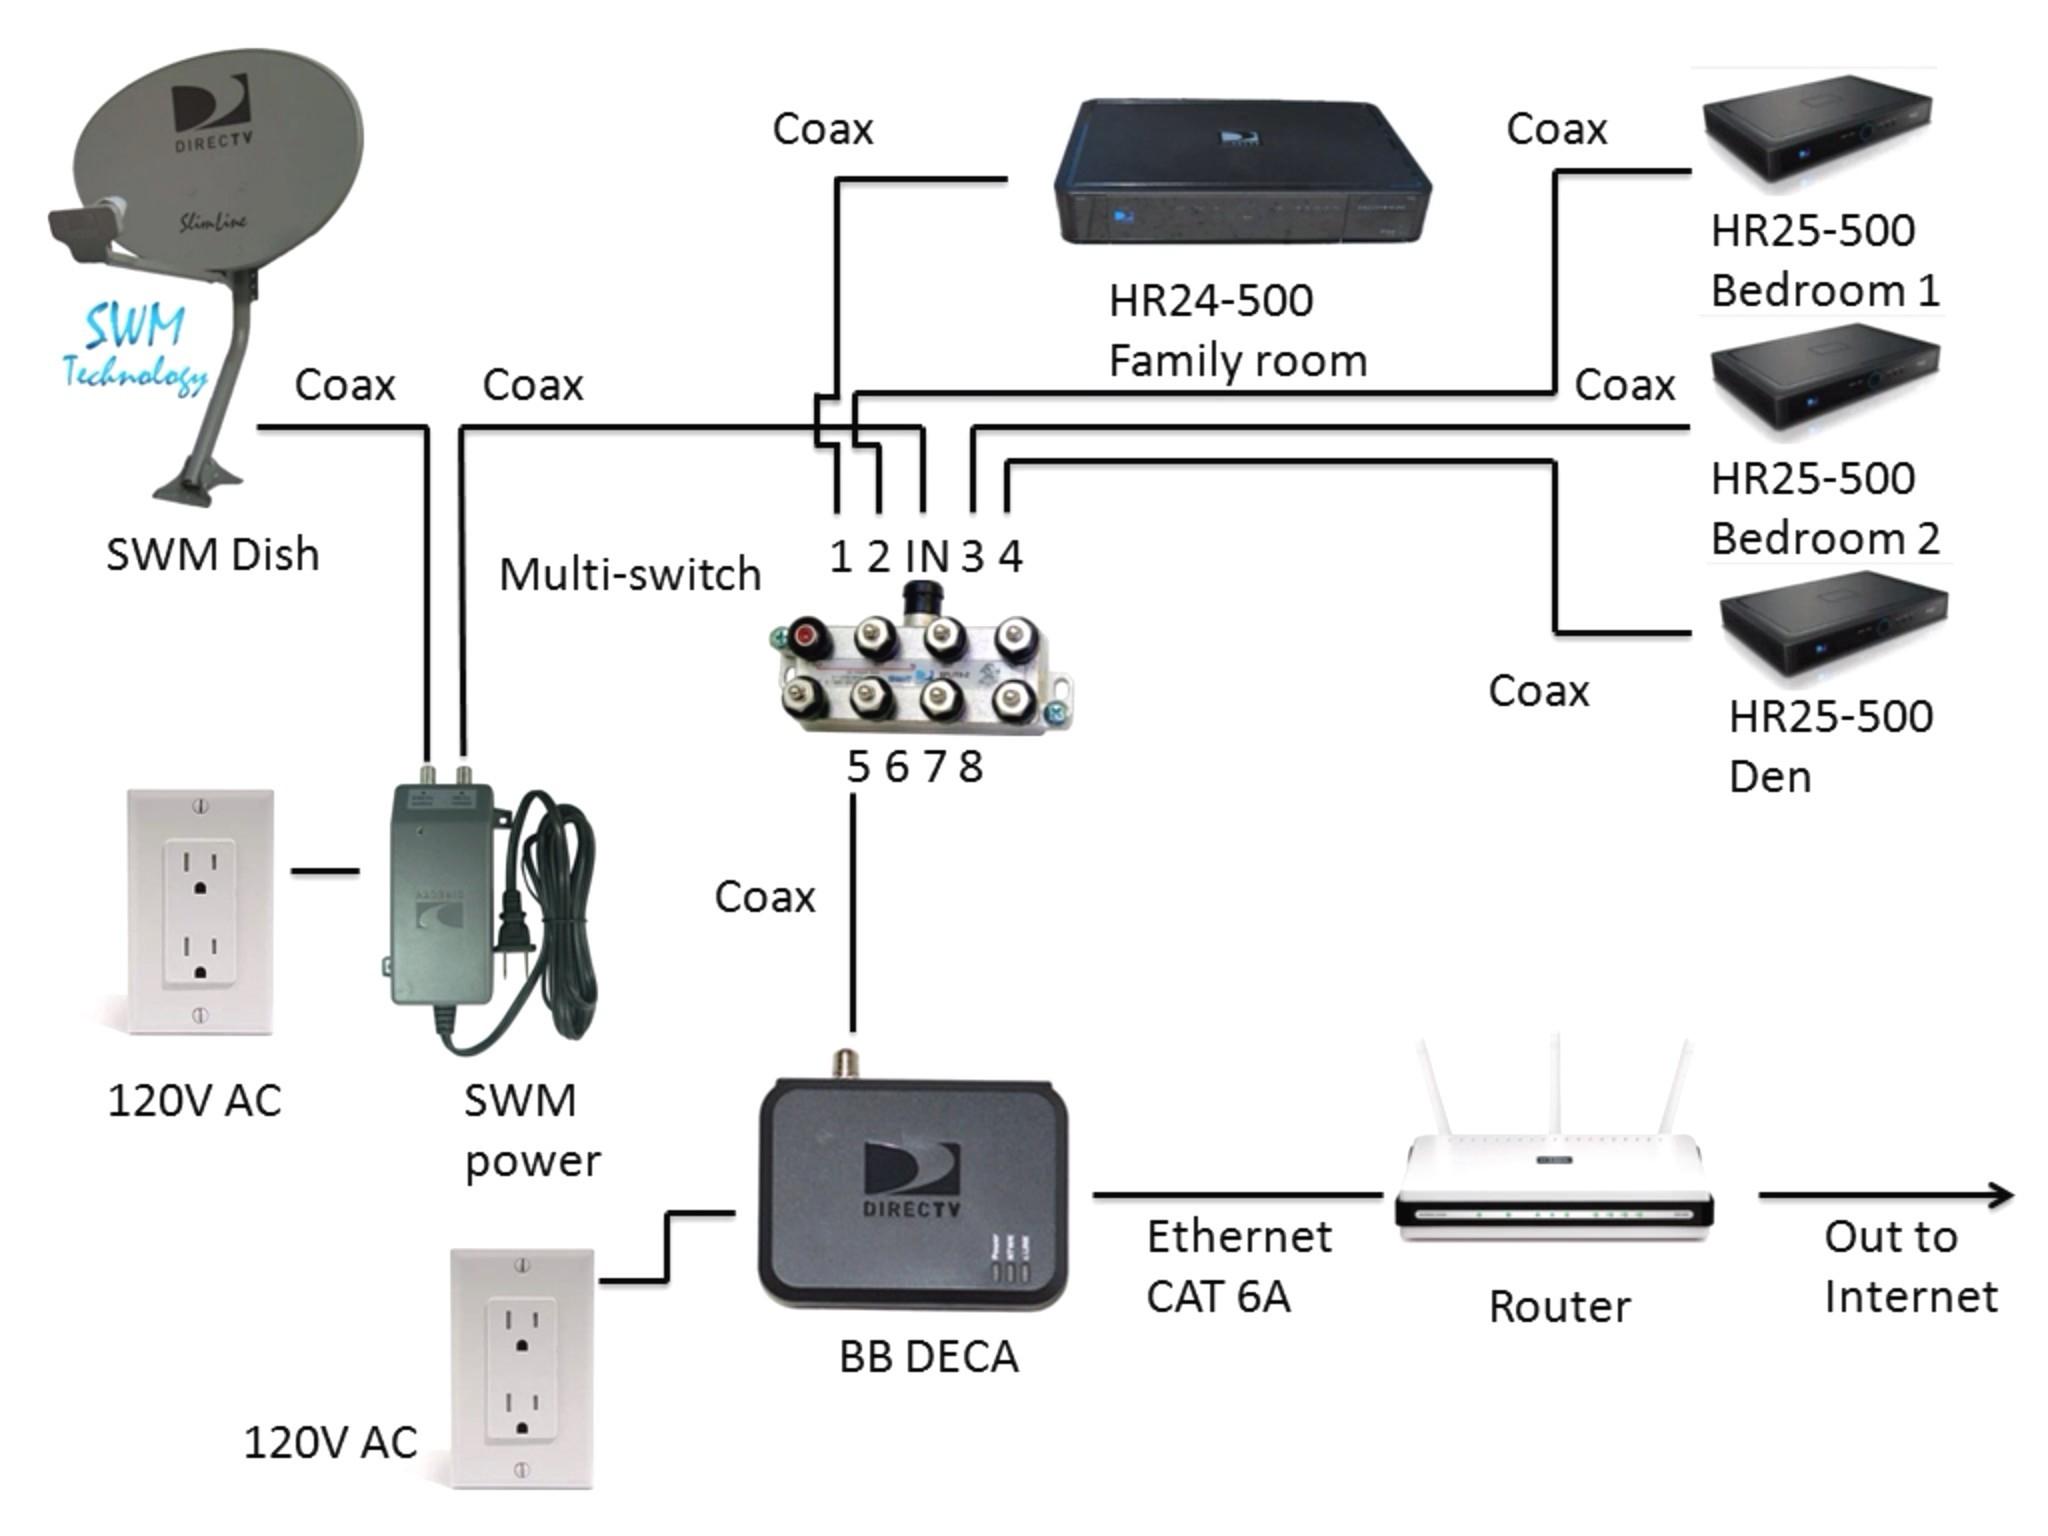 Genie Manlift Wiring Diagrams Bobcat Diagram Tractor 3232 Scissor Lift Directv Download Sample On